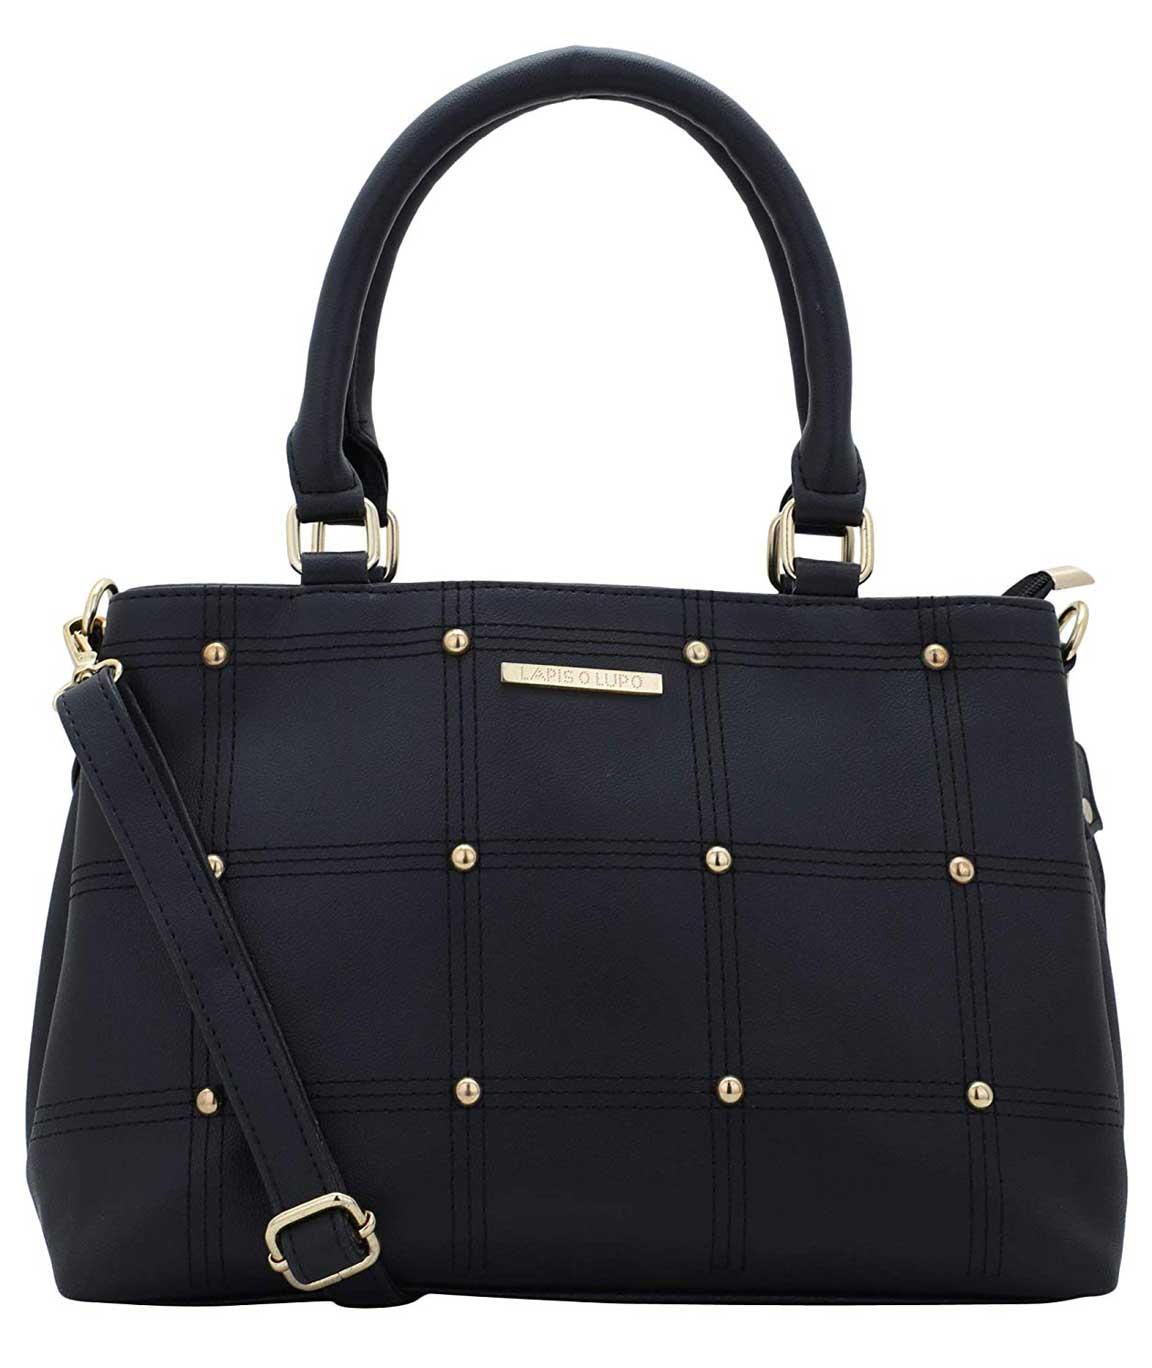 Lapis O Lupo Sewing Embroidery Women Handbag (Black)